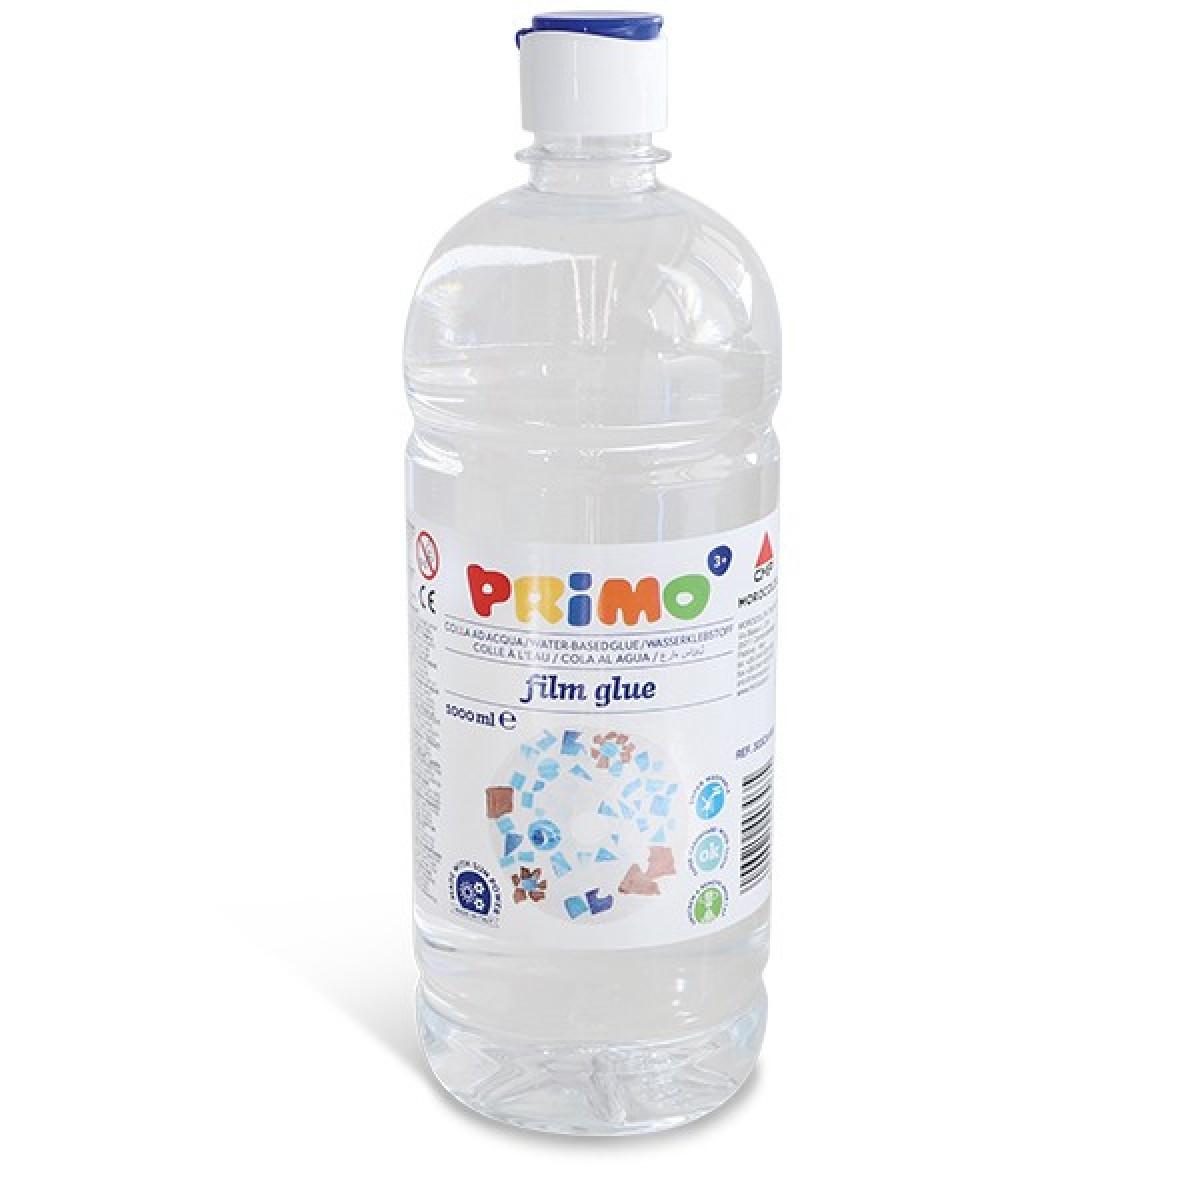 Primo Κόλλα Διαφανής Μπουκάλι 1kg Υλικά Χειροτεχνίας